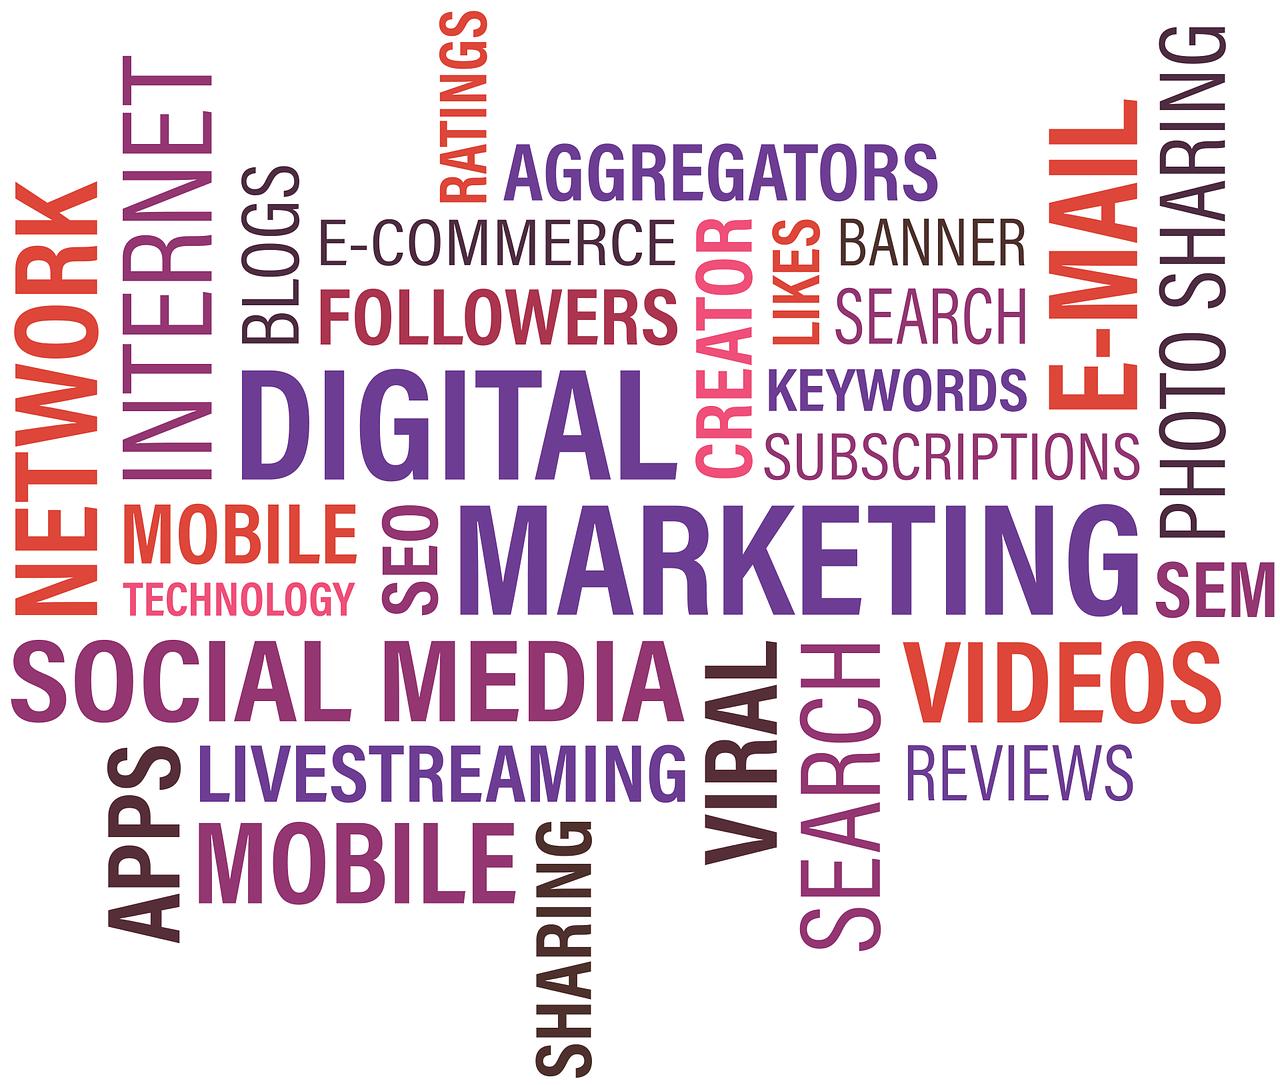 keywords digital marketing